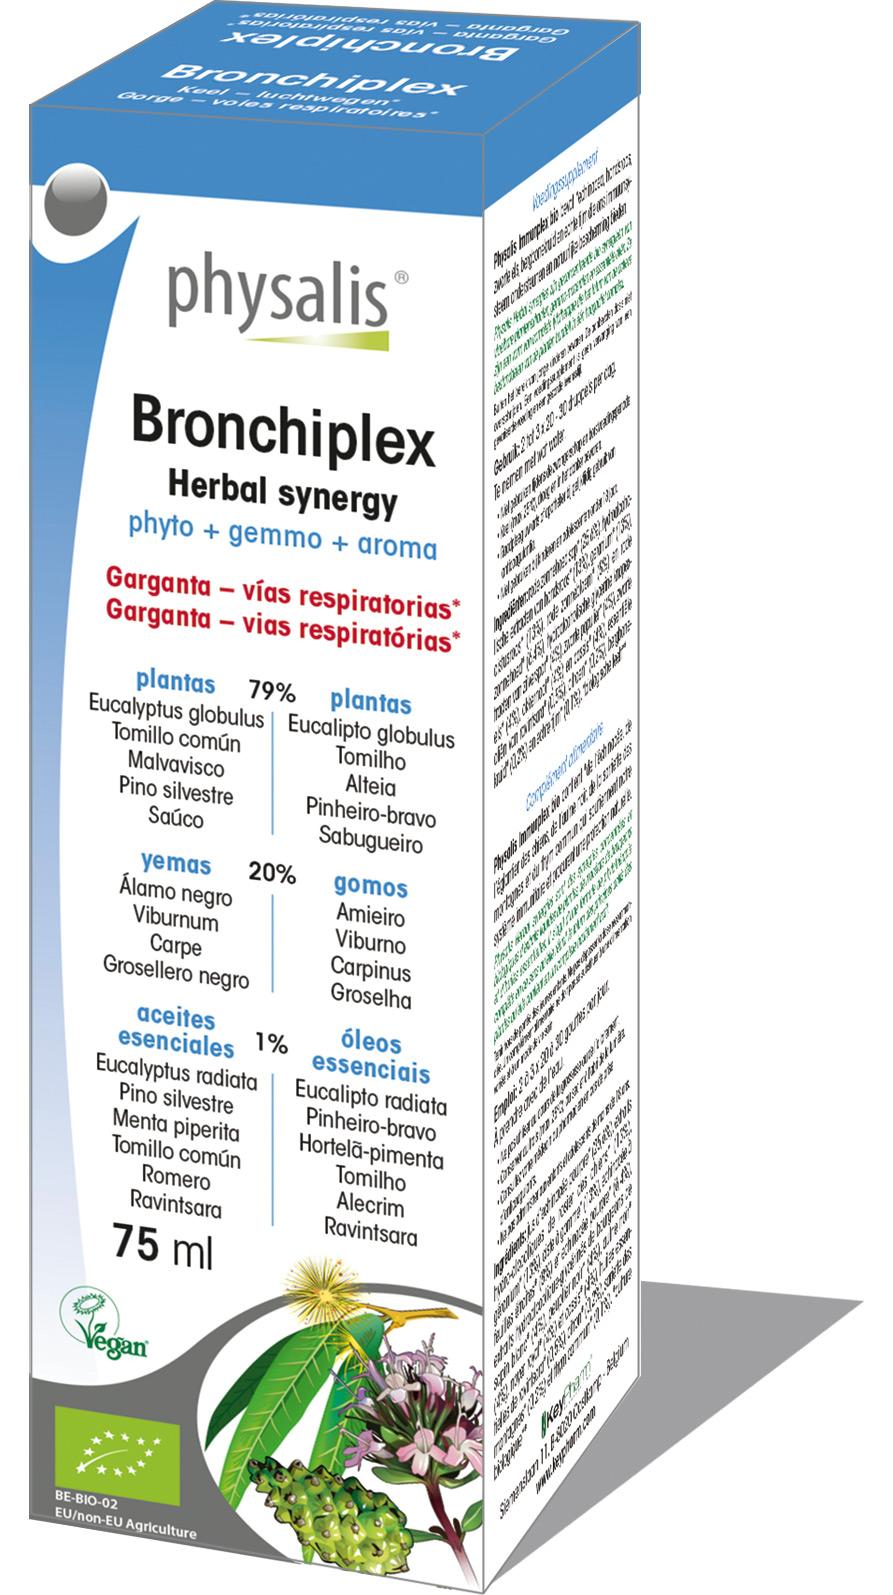 Bronchiplex - Herbal Synergy